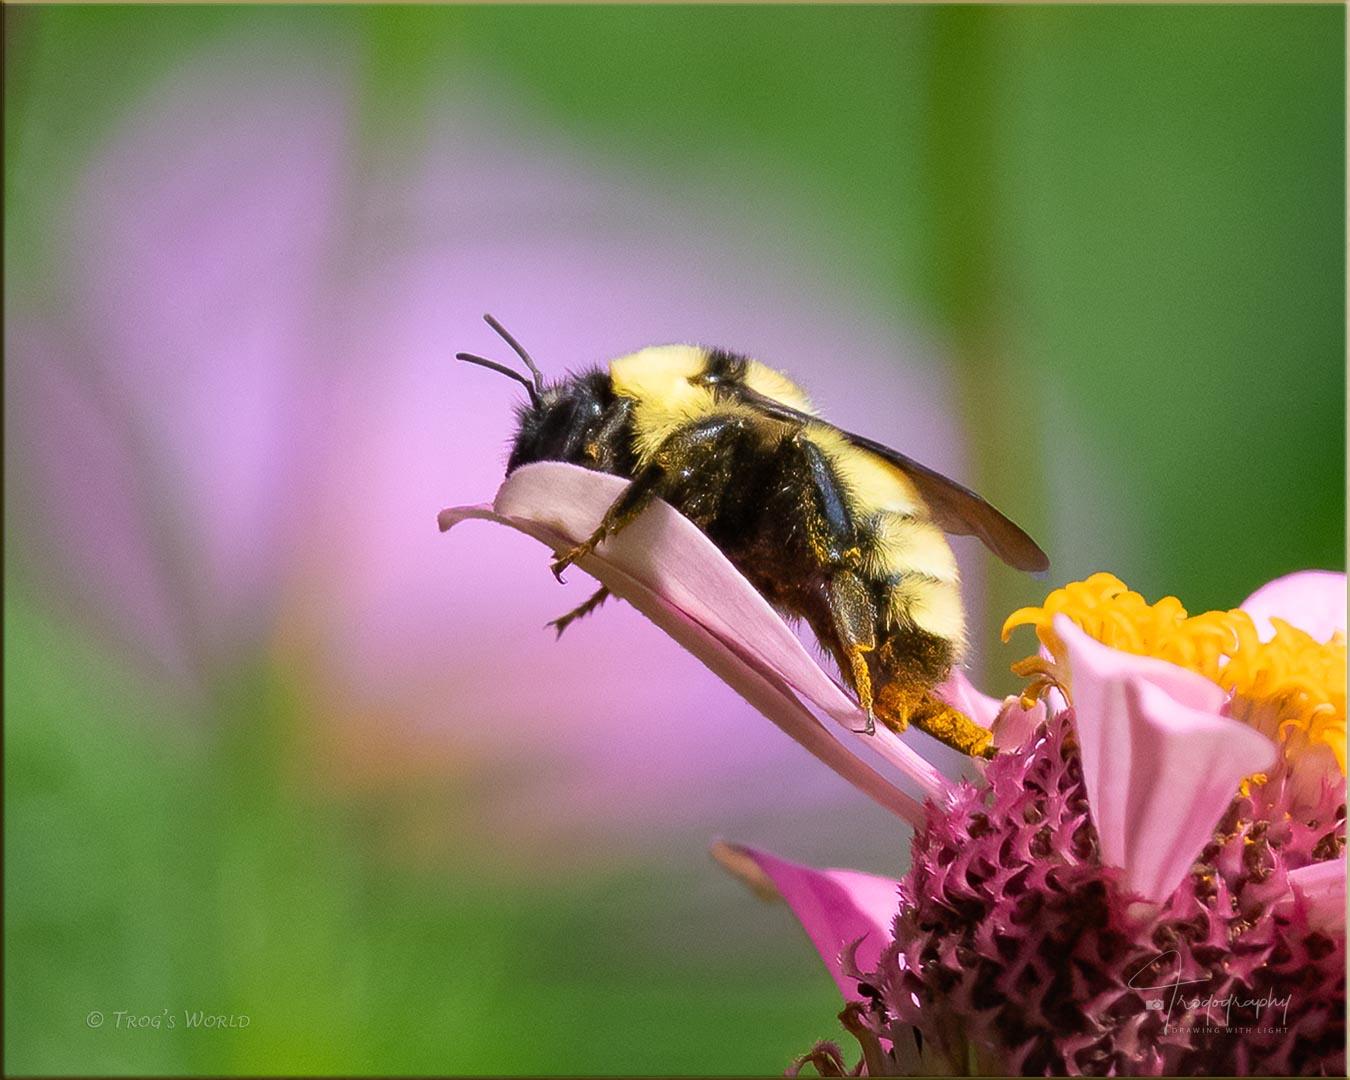 Bumblebee sleeping on a flower petal